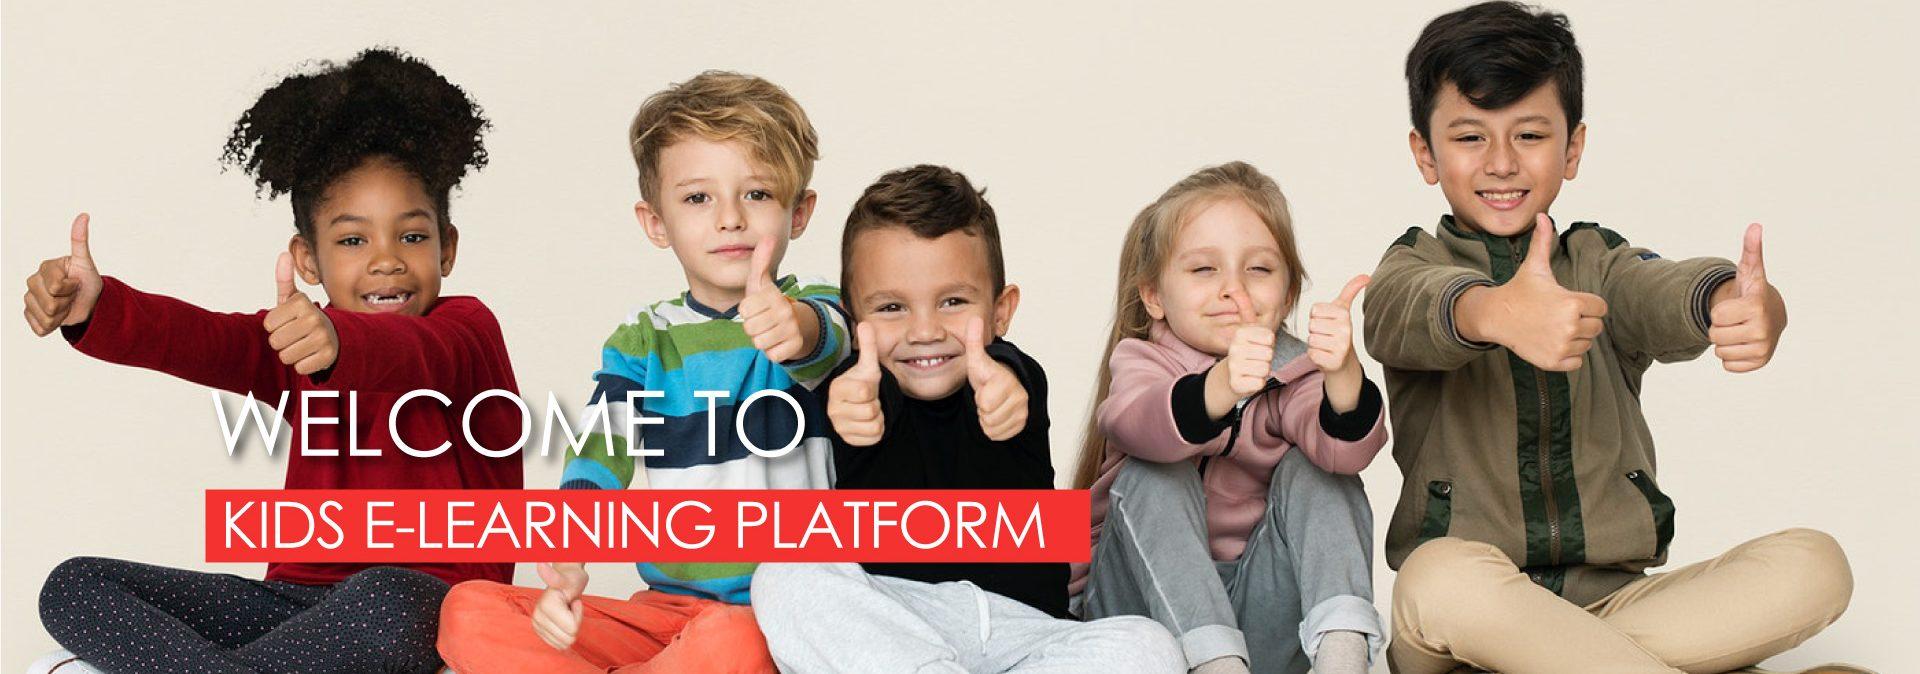 inicio-kids-elearning-platform-web-1